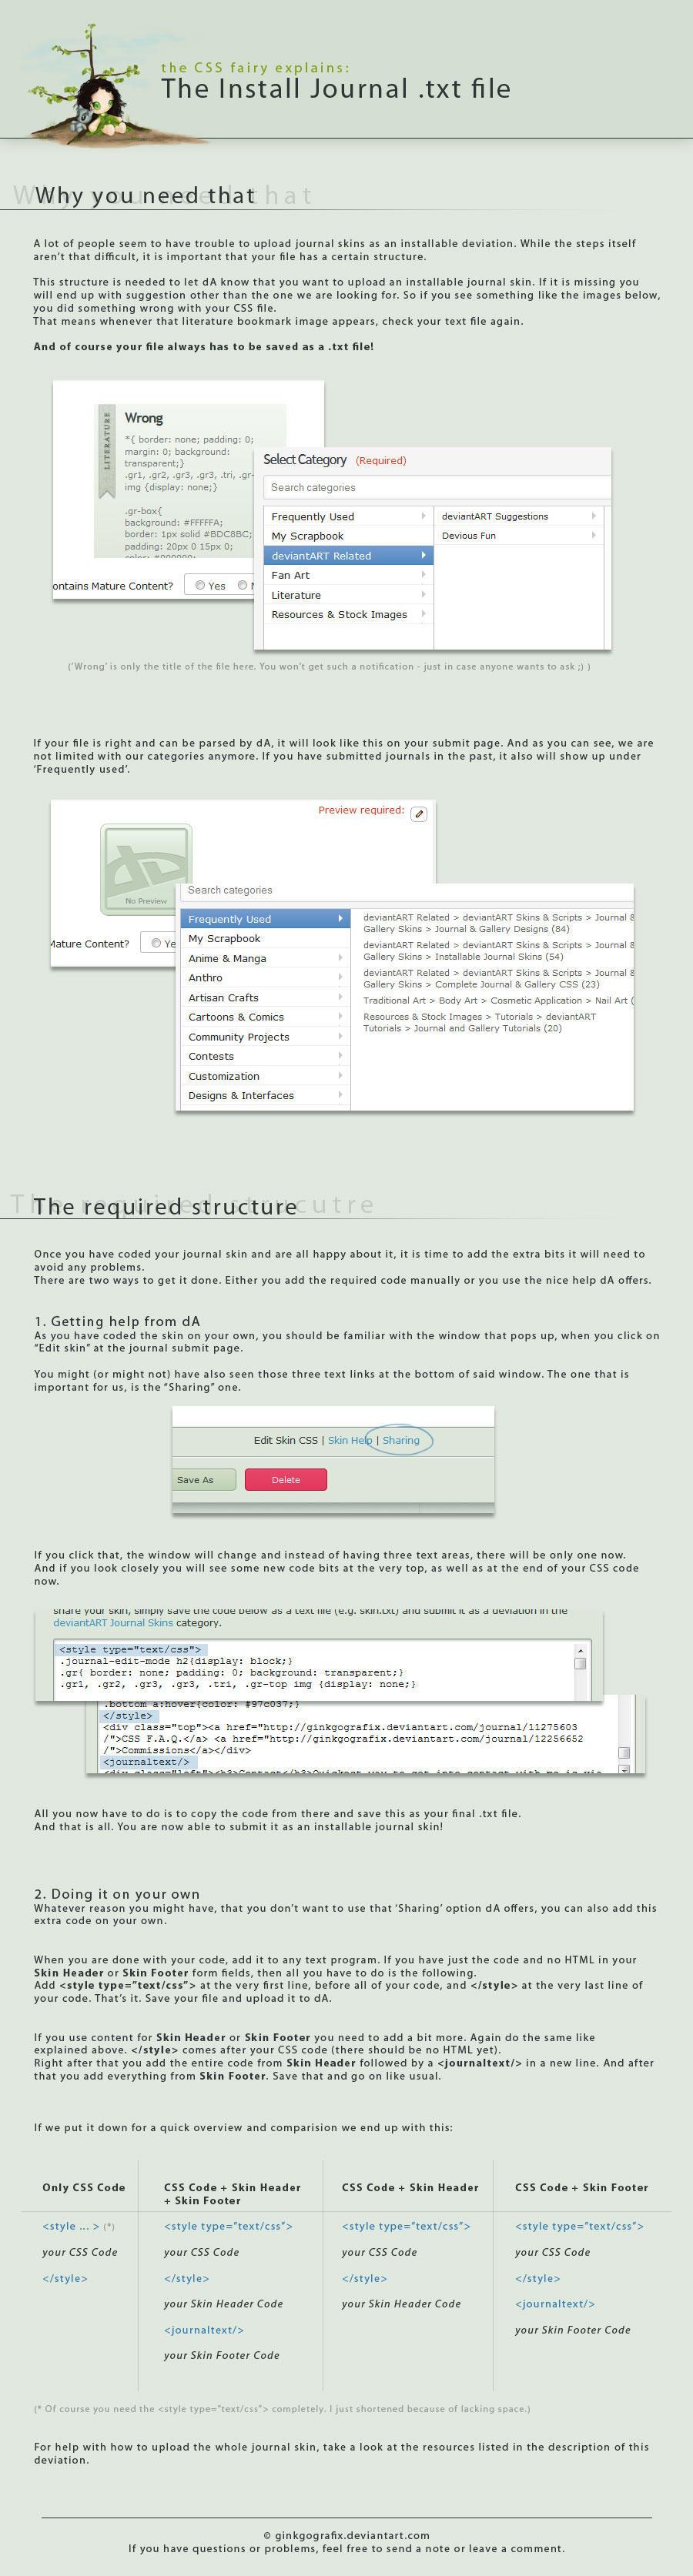 The Install Journal .txt file by ginkgografix